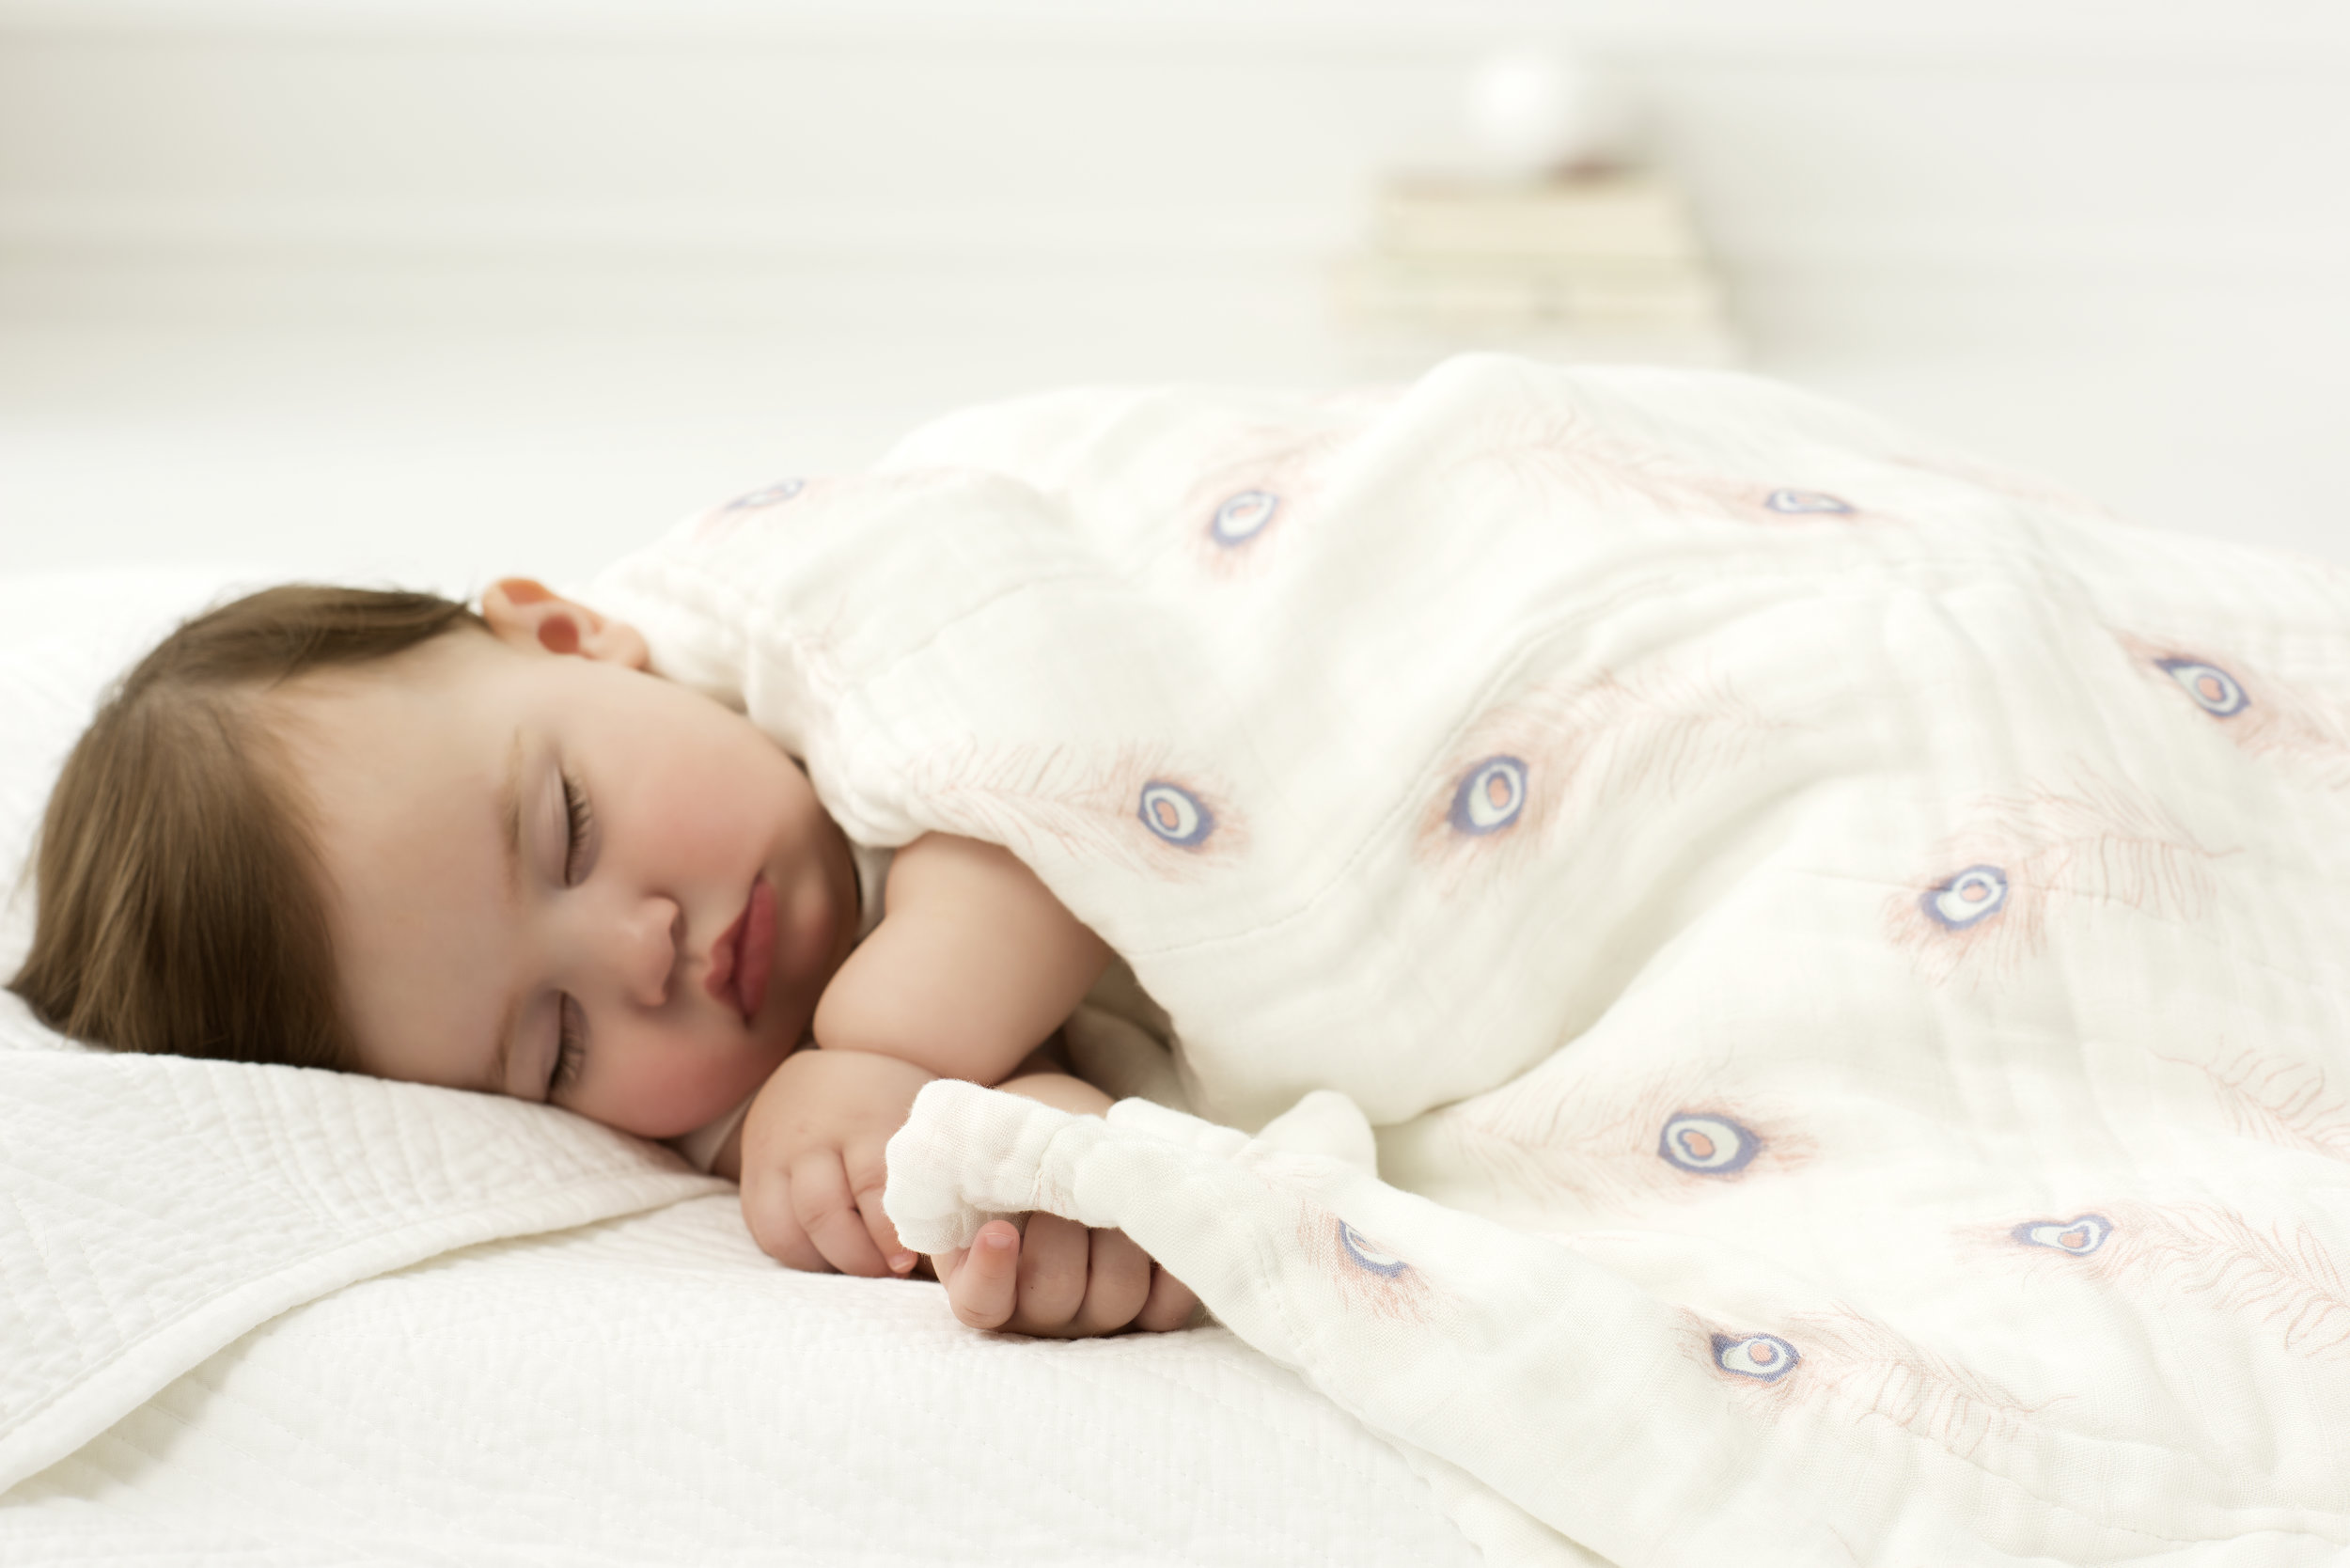 9323_3-baby-blanket-silky-soft-muslin-feather-light.jpg